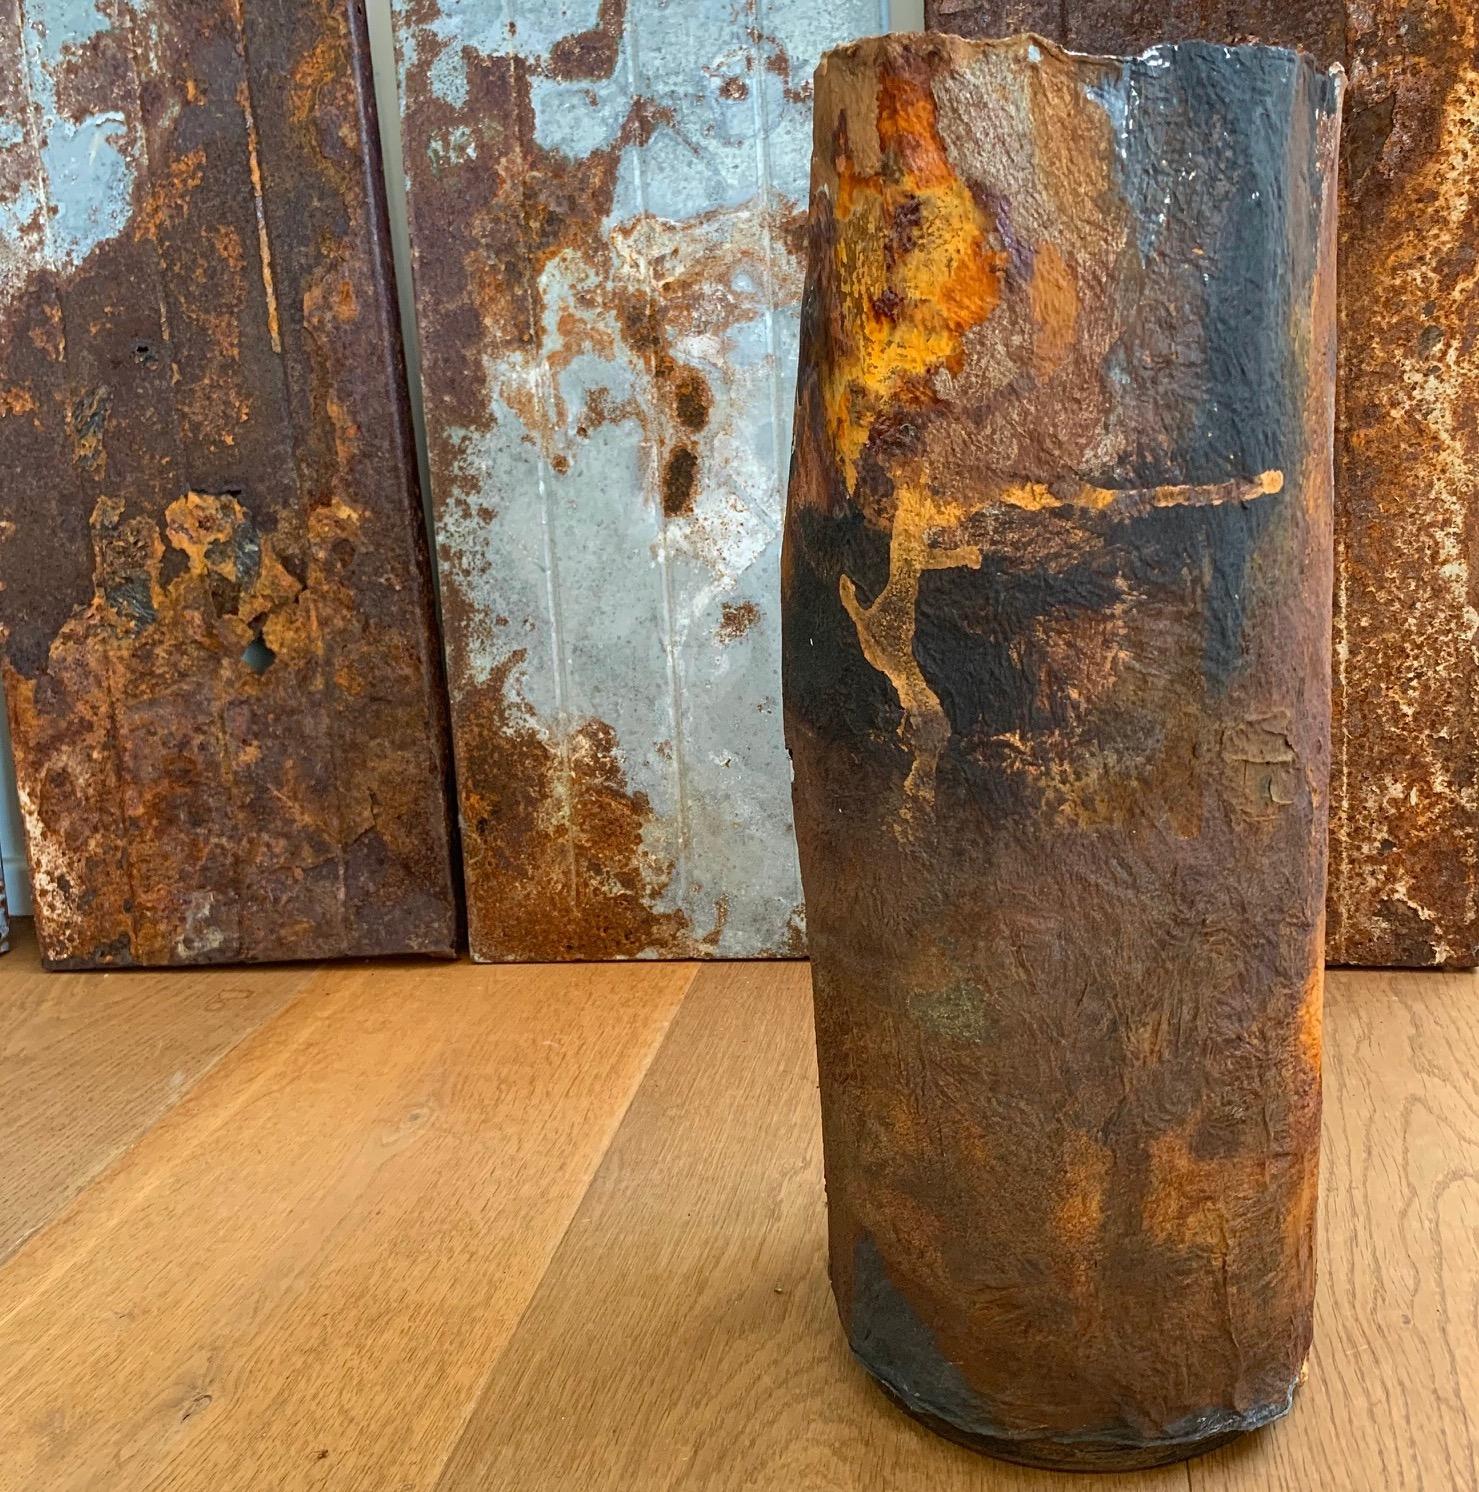 Joomchi Vessel with rusty shelving